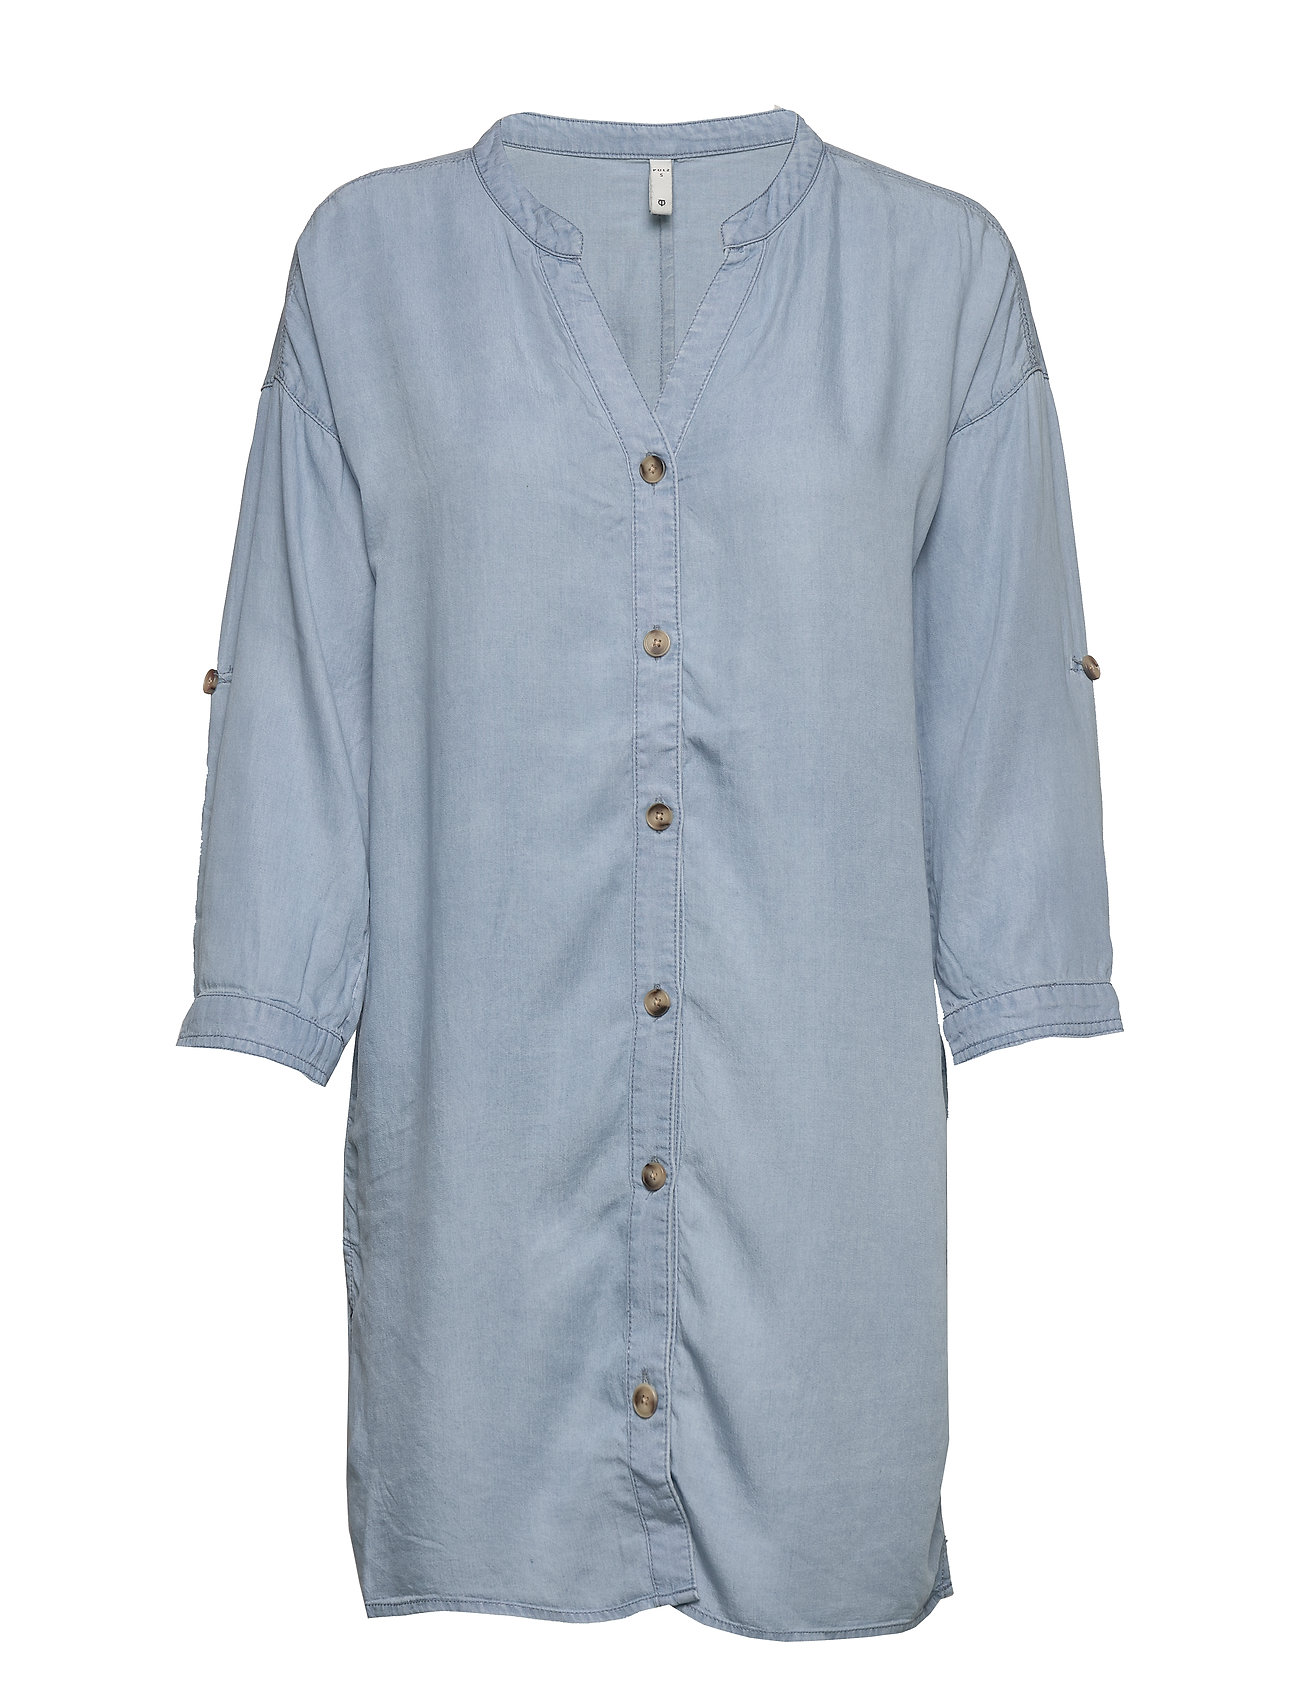 Image of Pzdonatella Shirt Tunika Blå Pulz Jeans (3406307783)